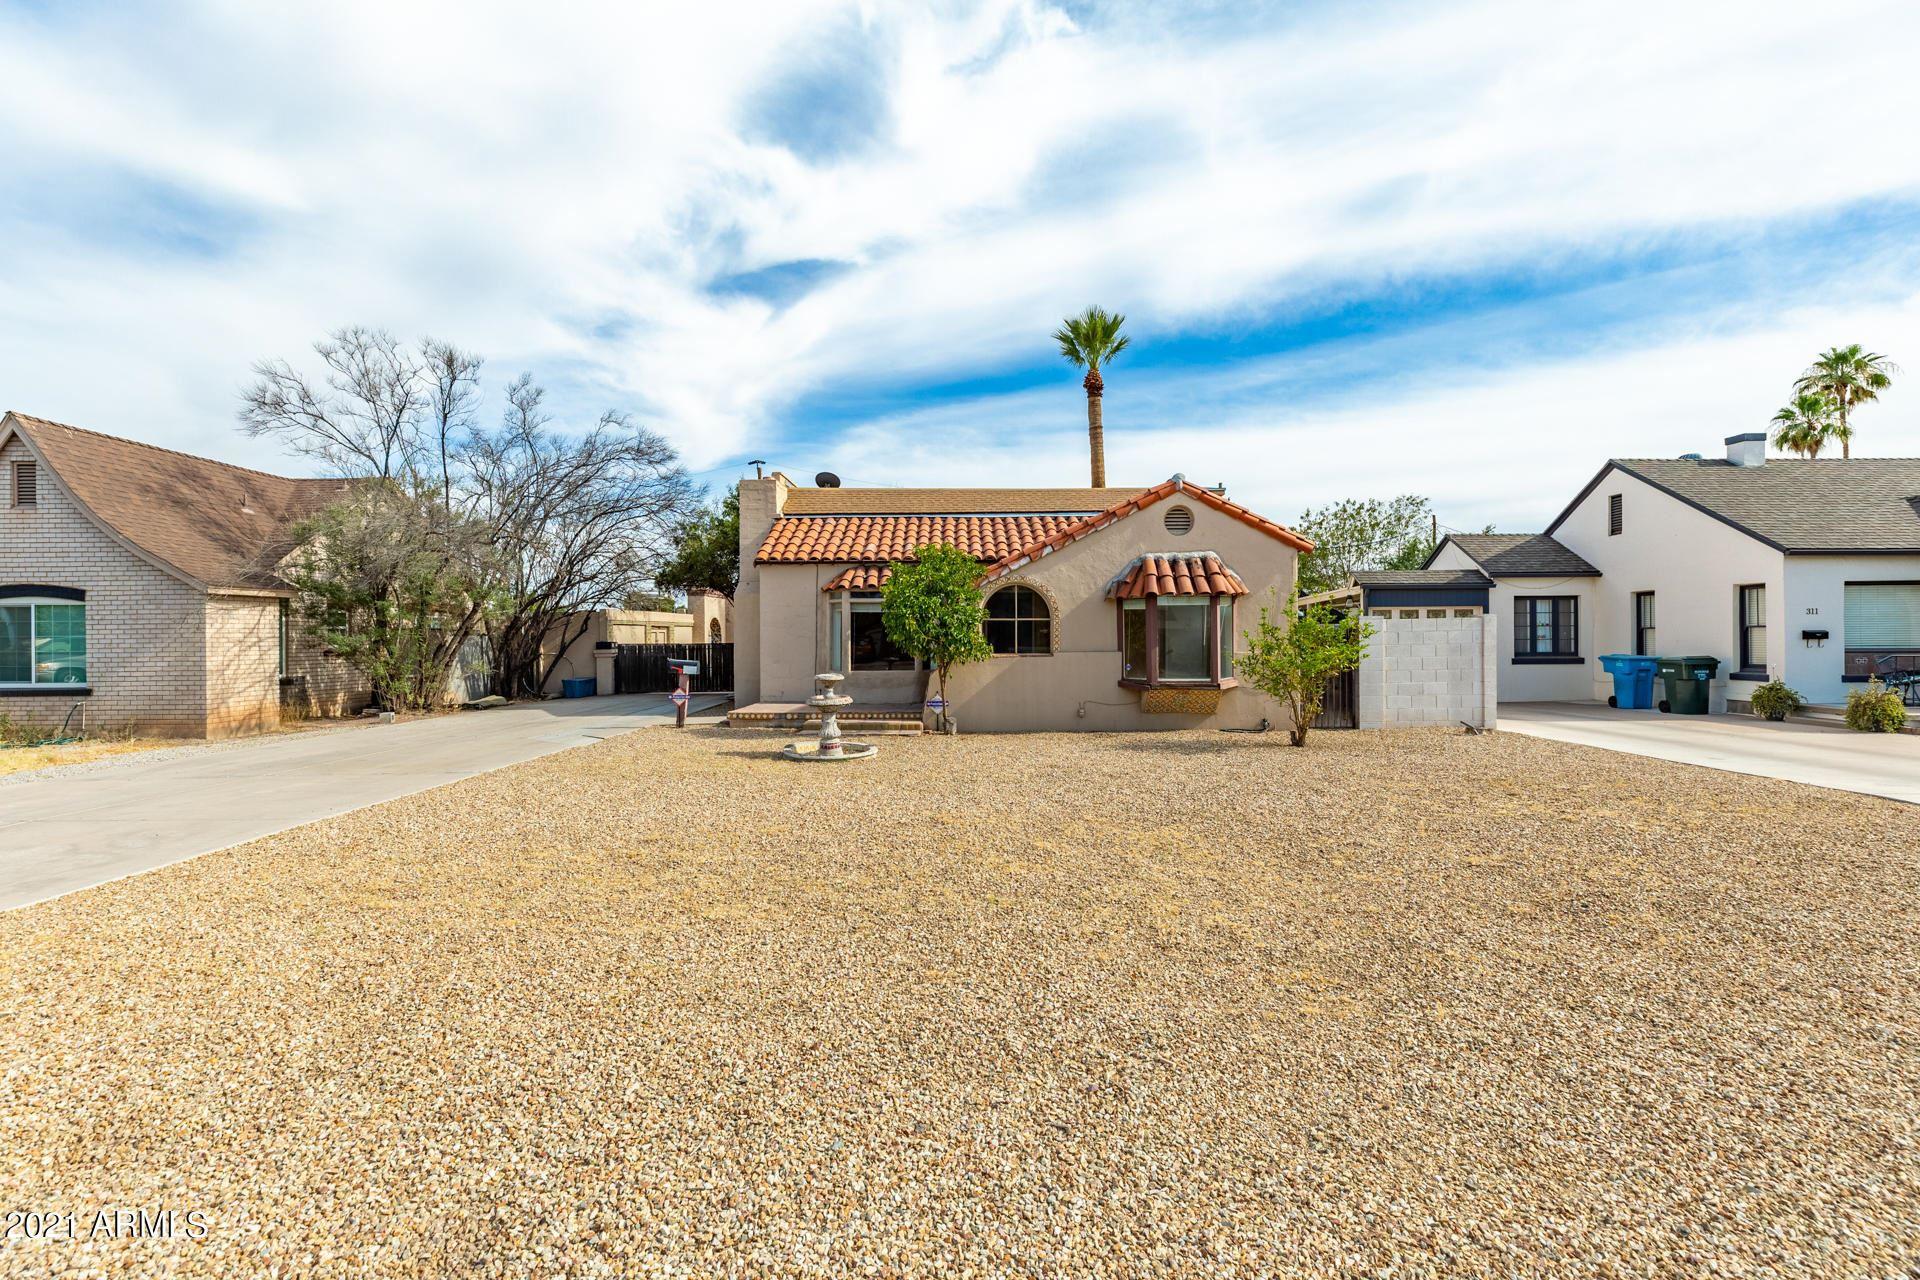 309 W PIERSON Street, Phoenix, AZ 85013 - MLS#: 6248474